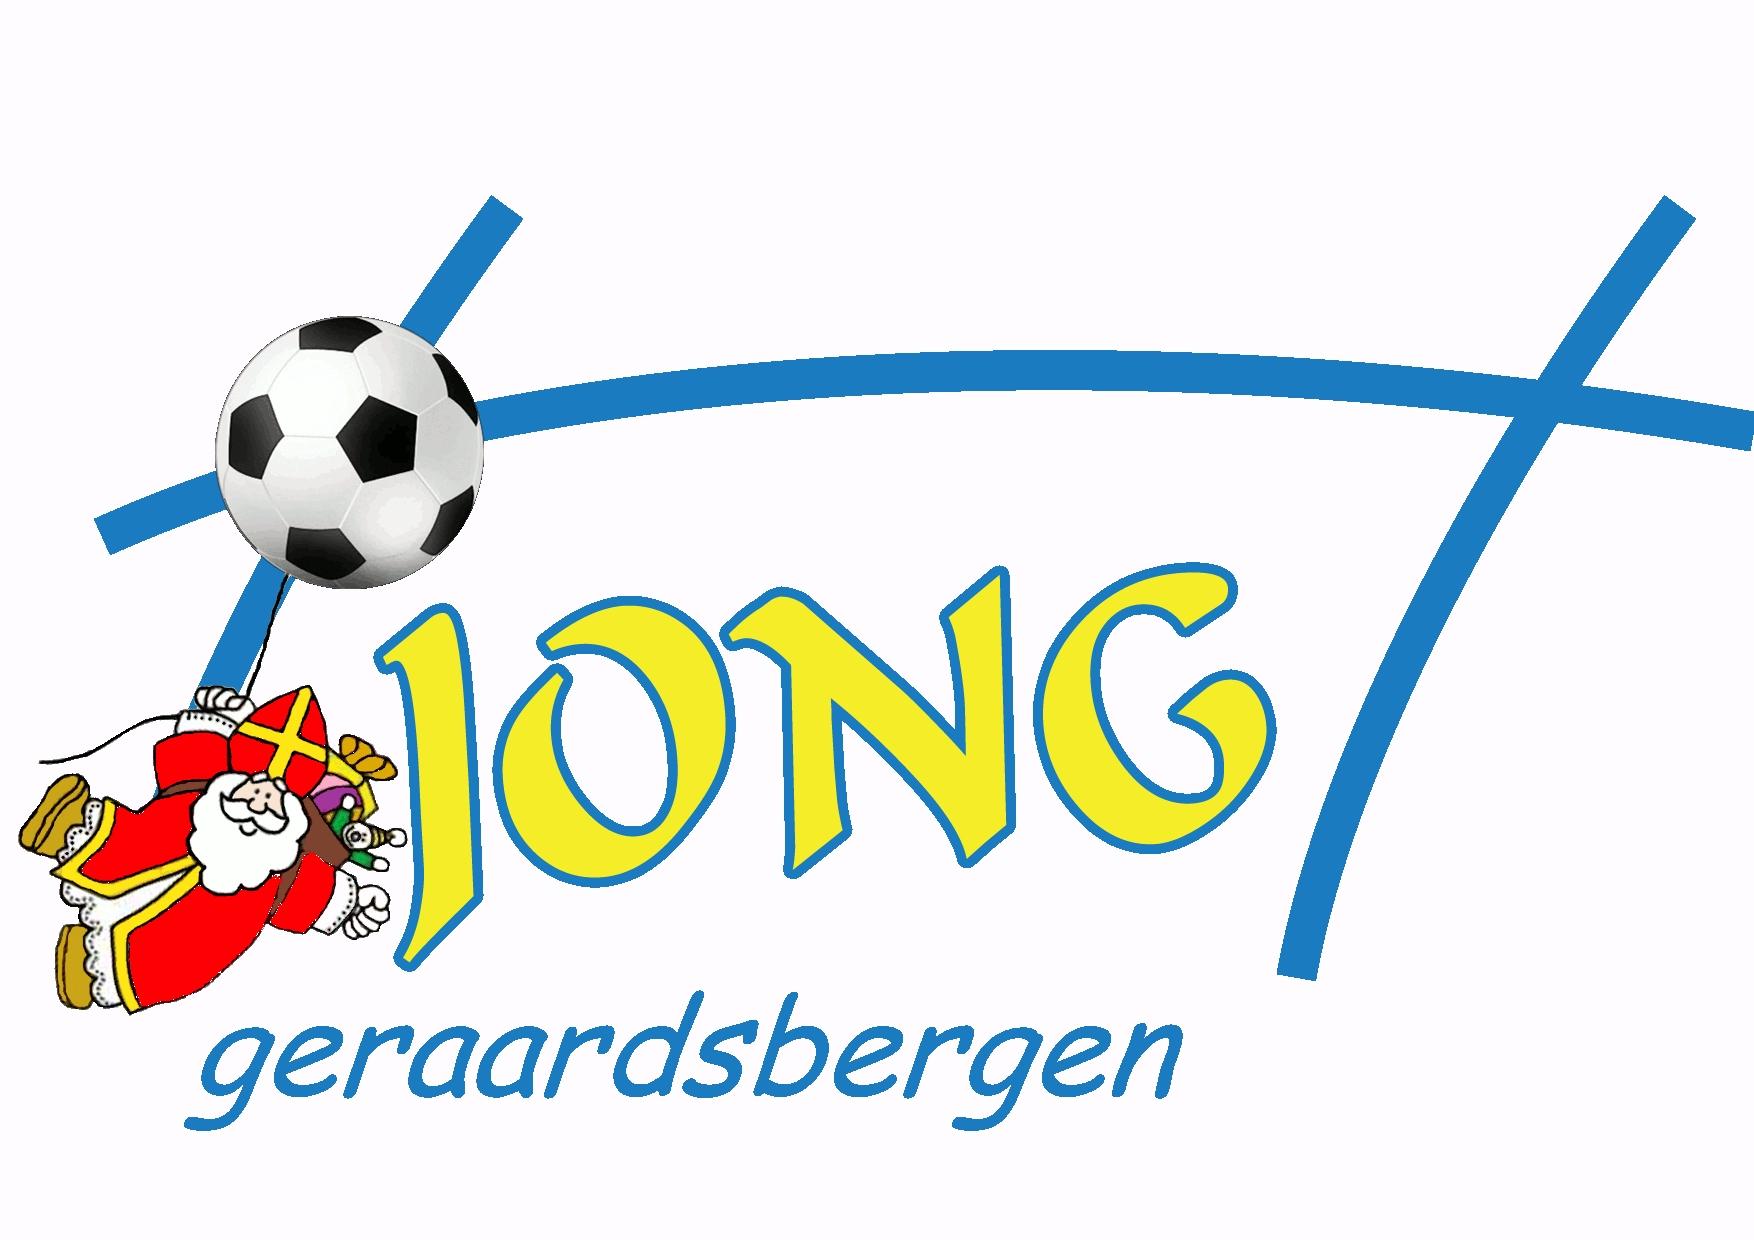 Zaterdag 01/12 in Sporthal De Veldmuis: vriendenmatch en aansluitend sinterklaasfeest